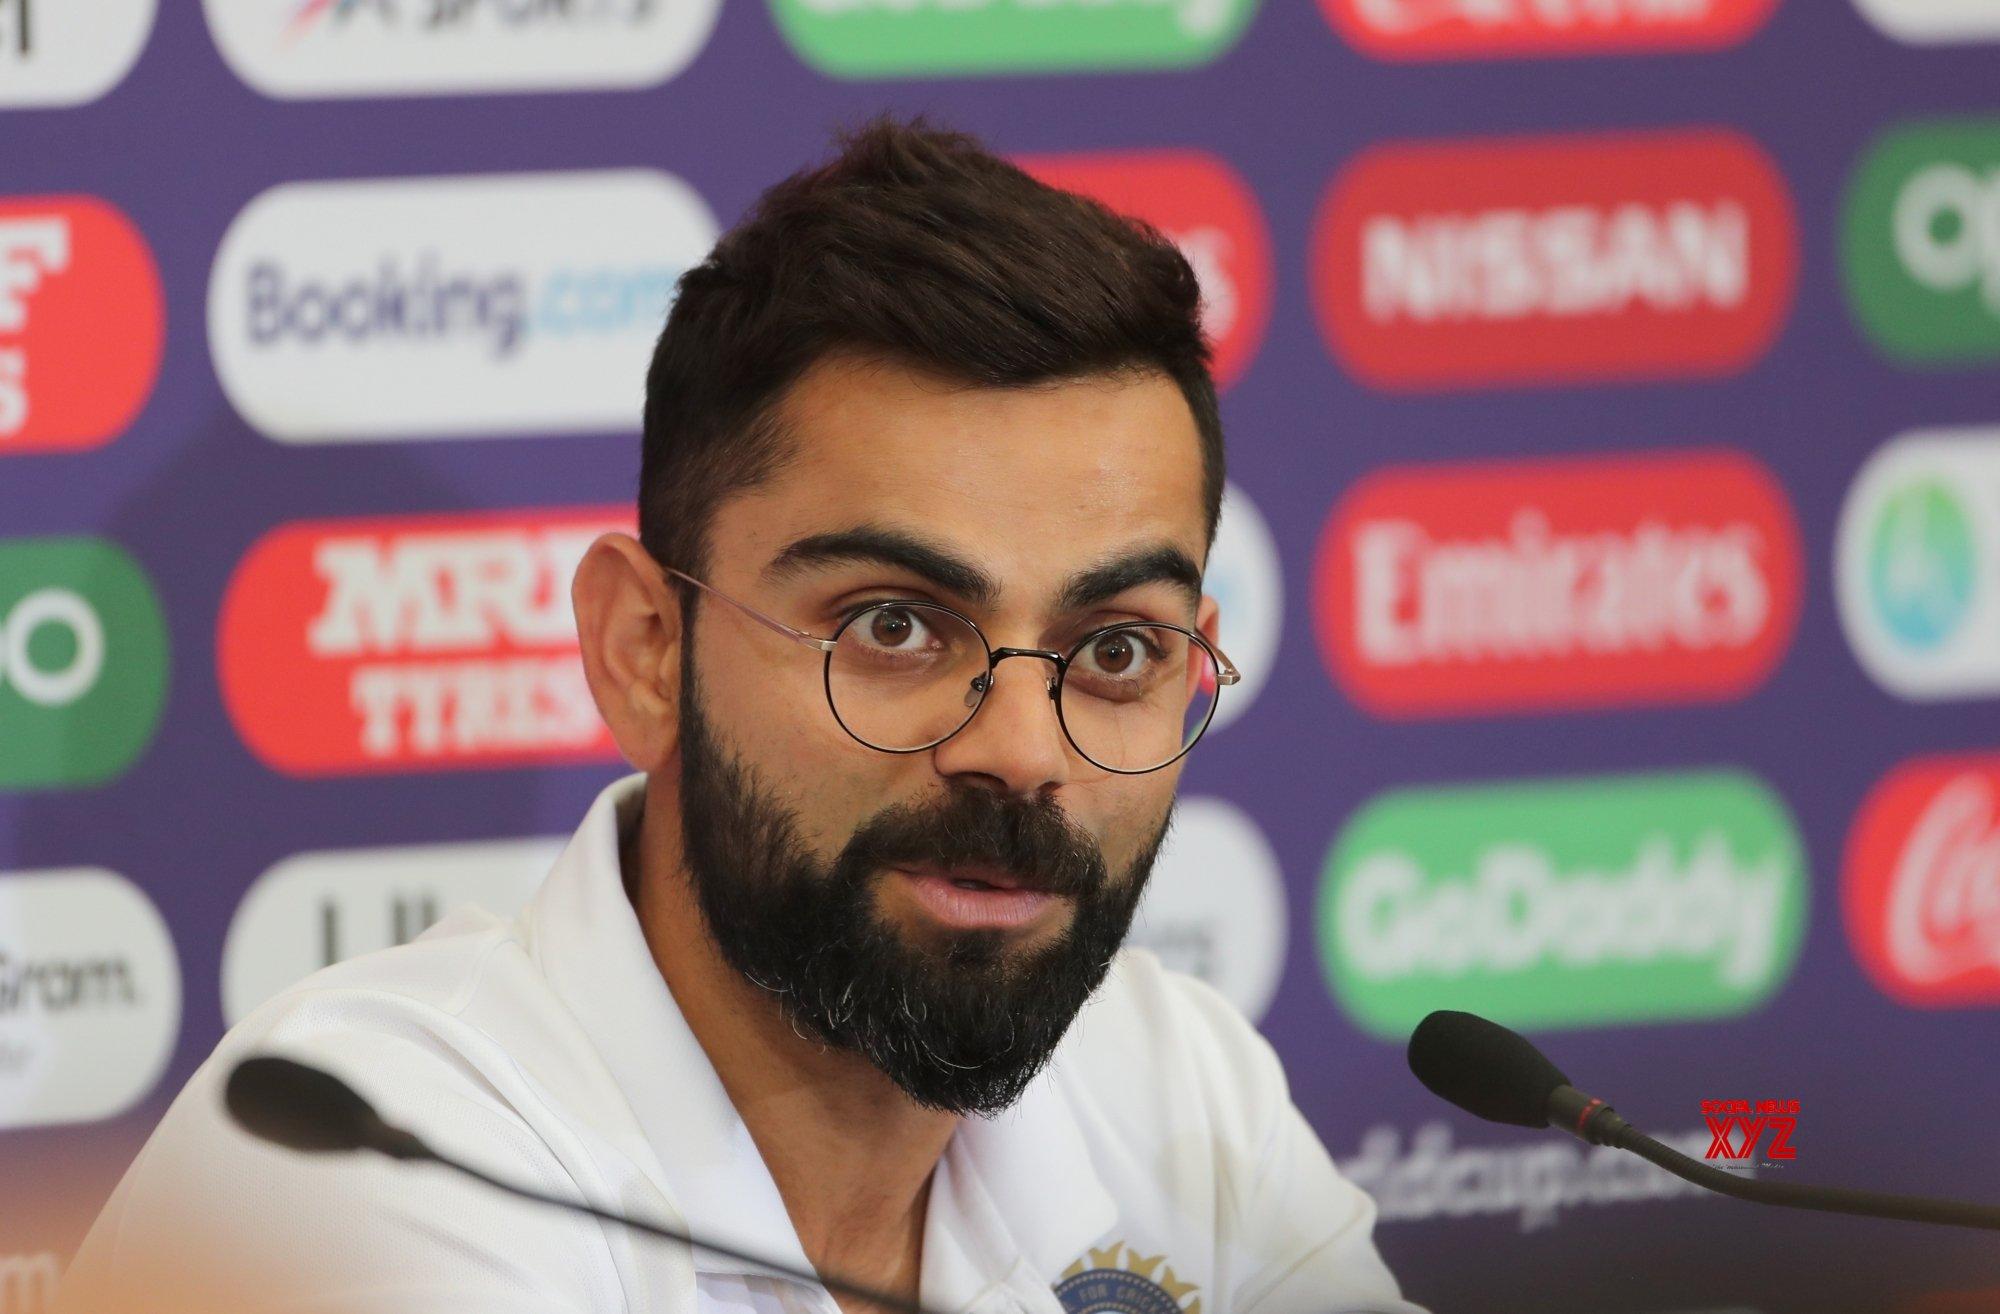 Dhawan motivated, want to keep him back: Kohli